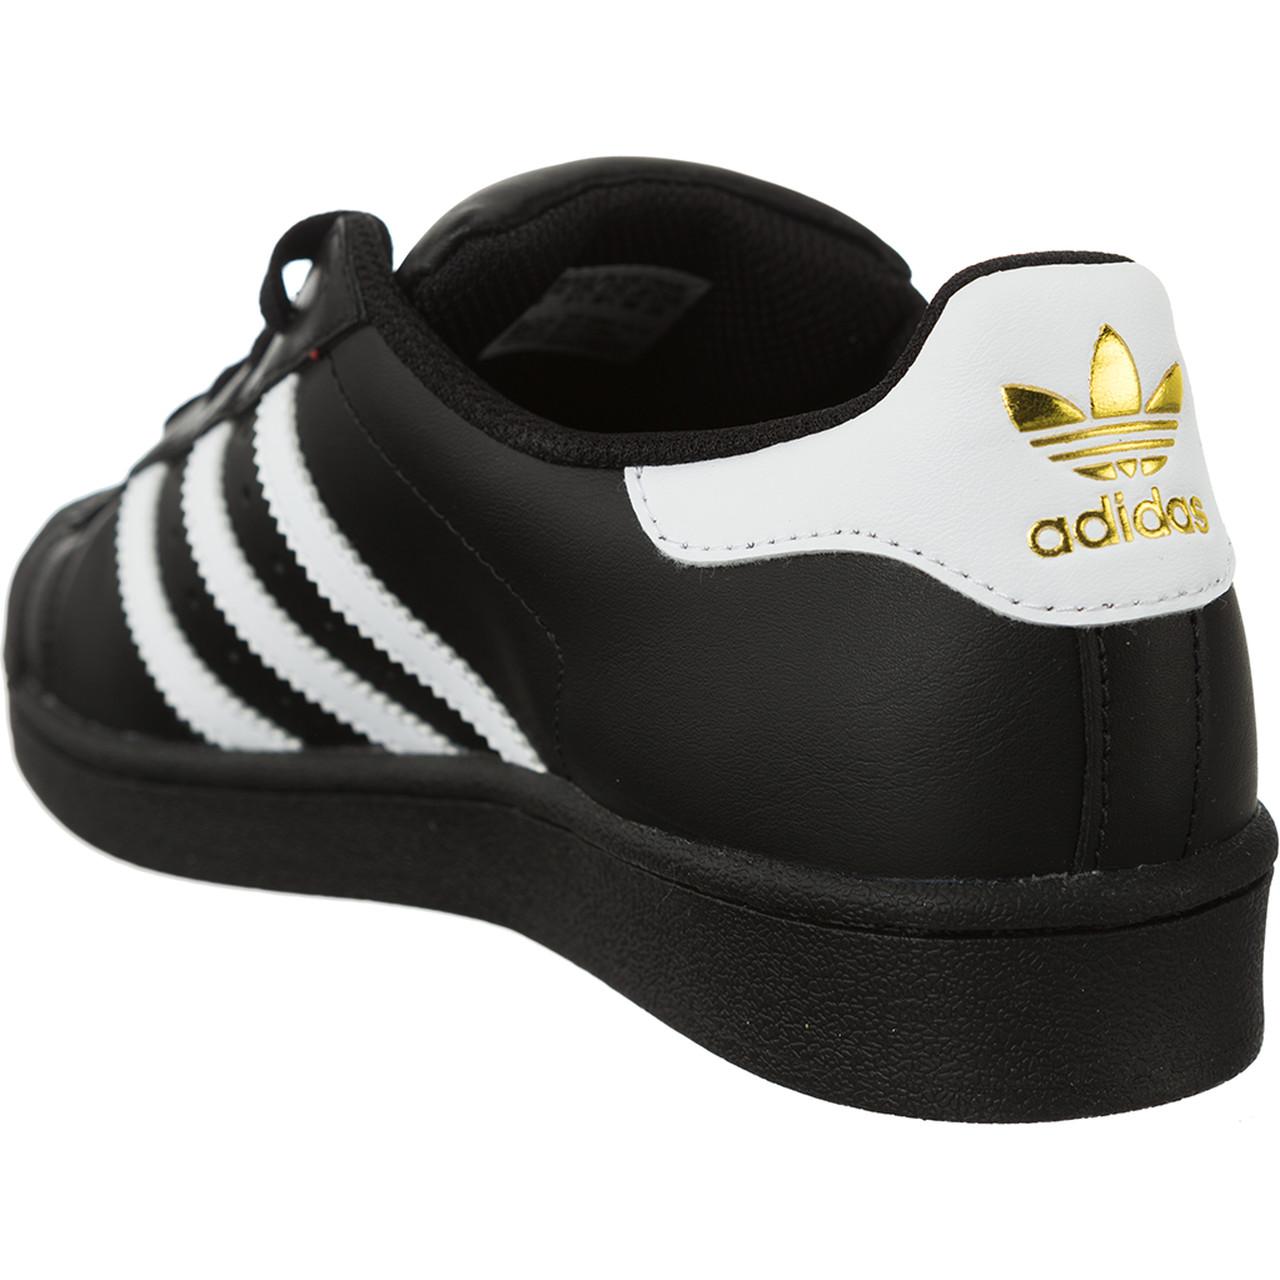 adidas superstar czarne na nogach